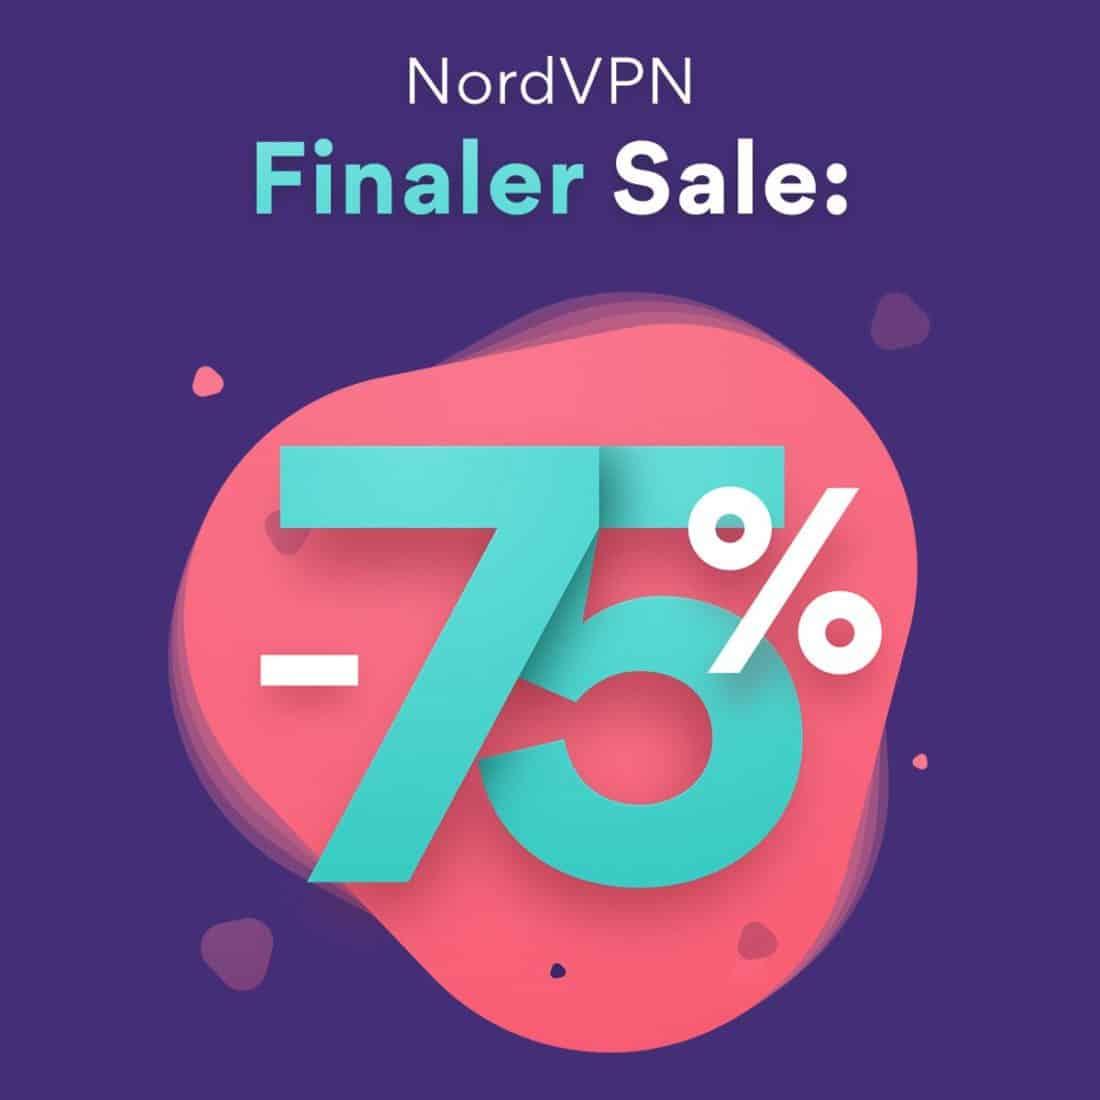 NordVPN Summer Sale